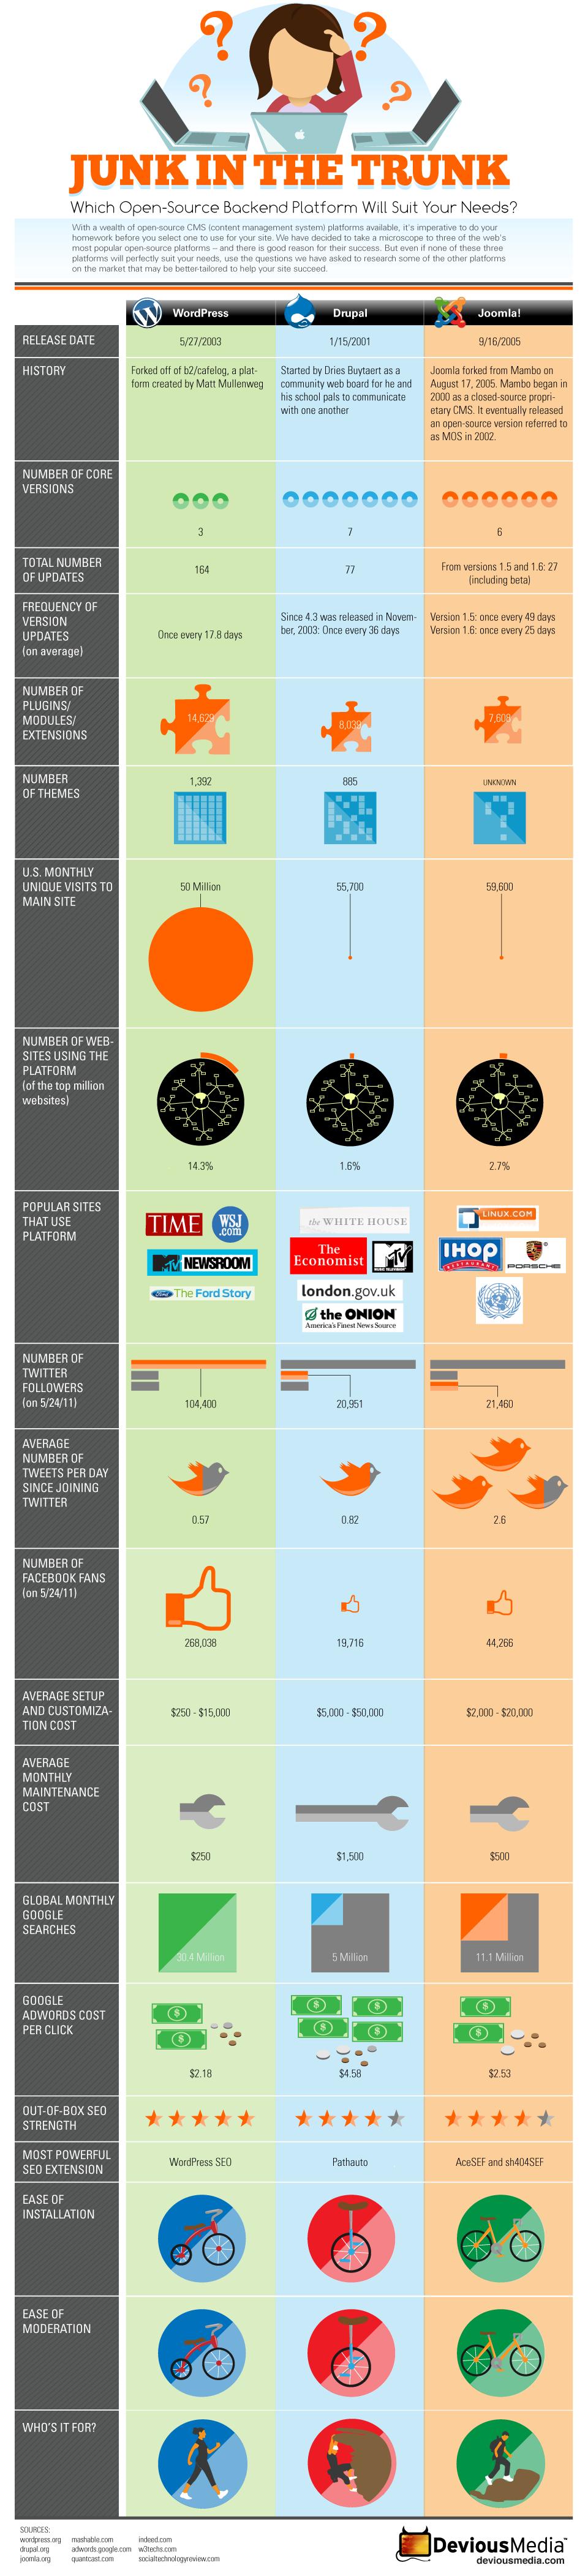 comparaison-wordpress-joomla-drupal